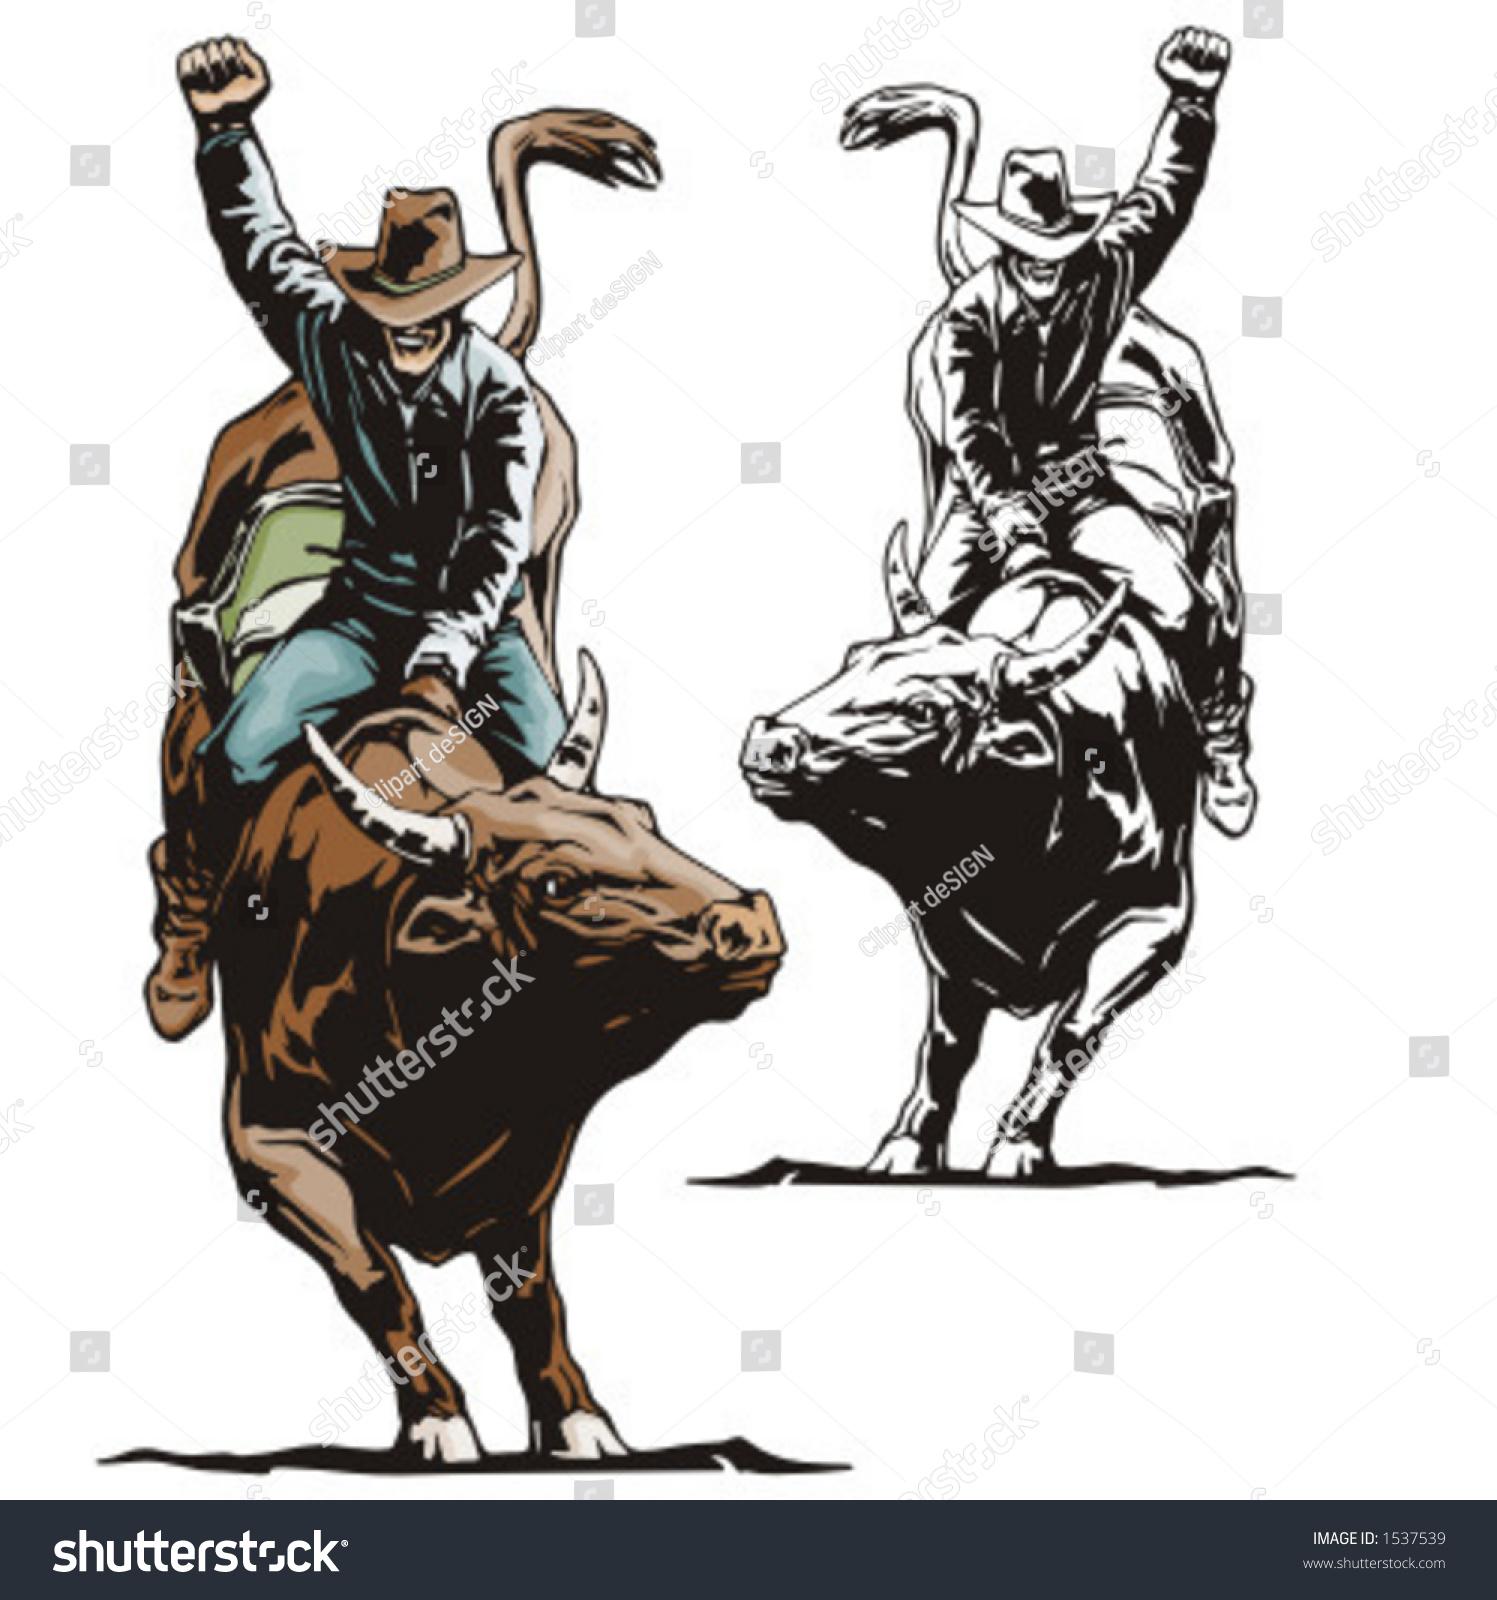 Illustration Rodeo Cowboy Riding Bull Stock Vector 1537539